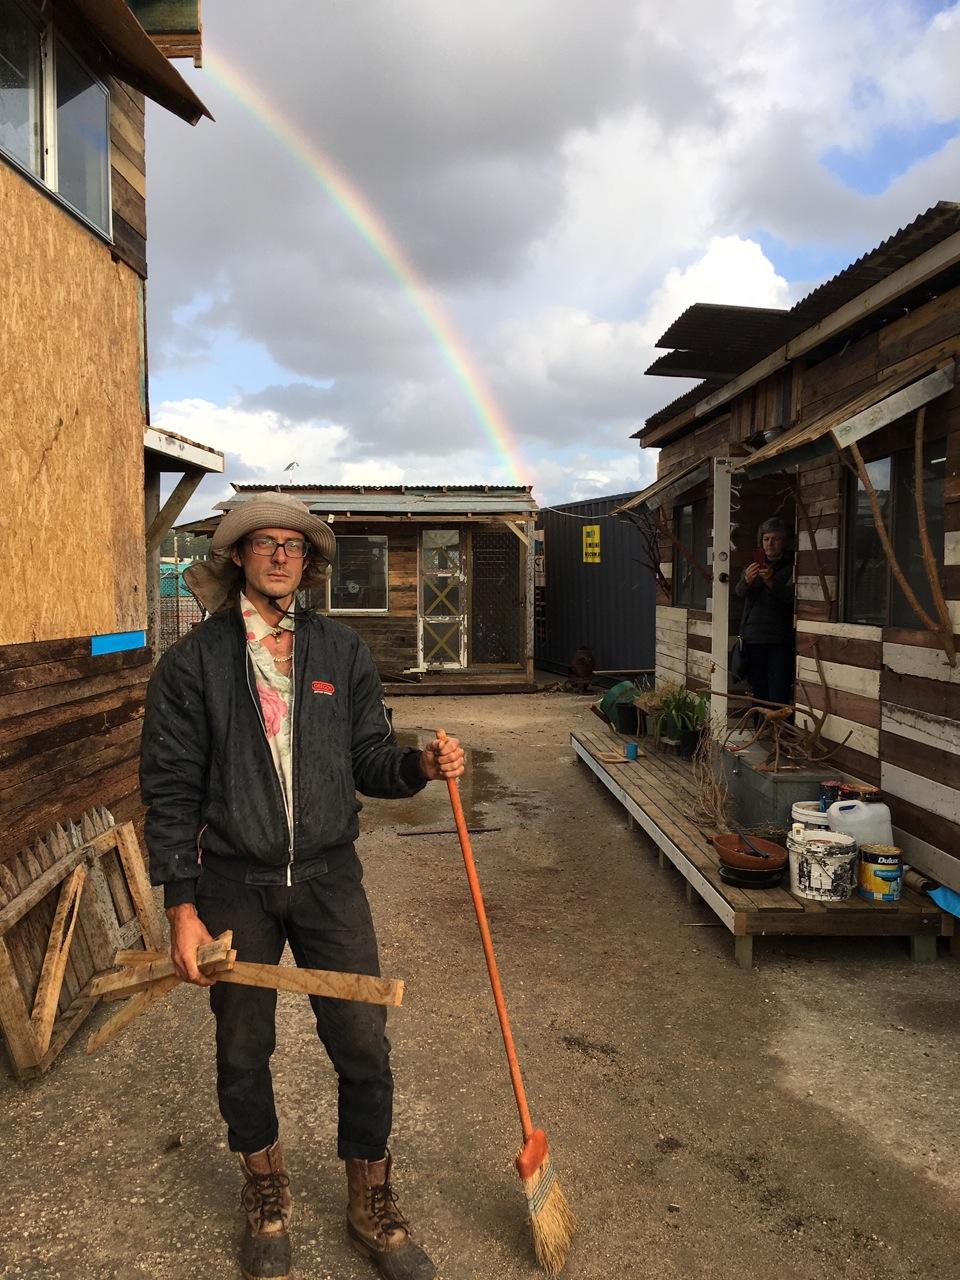 Jessee under a rainbow at his resort